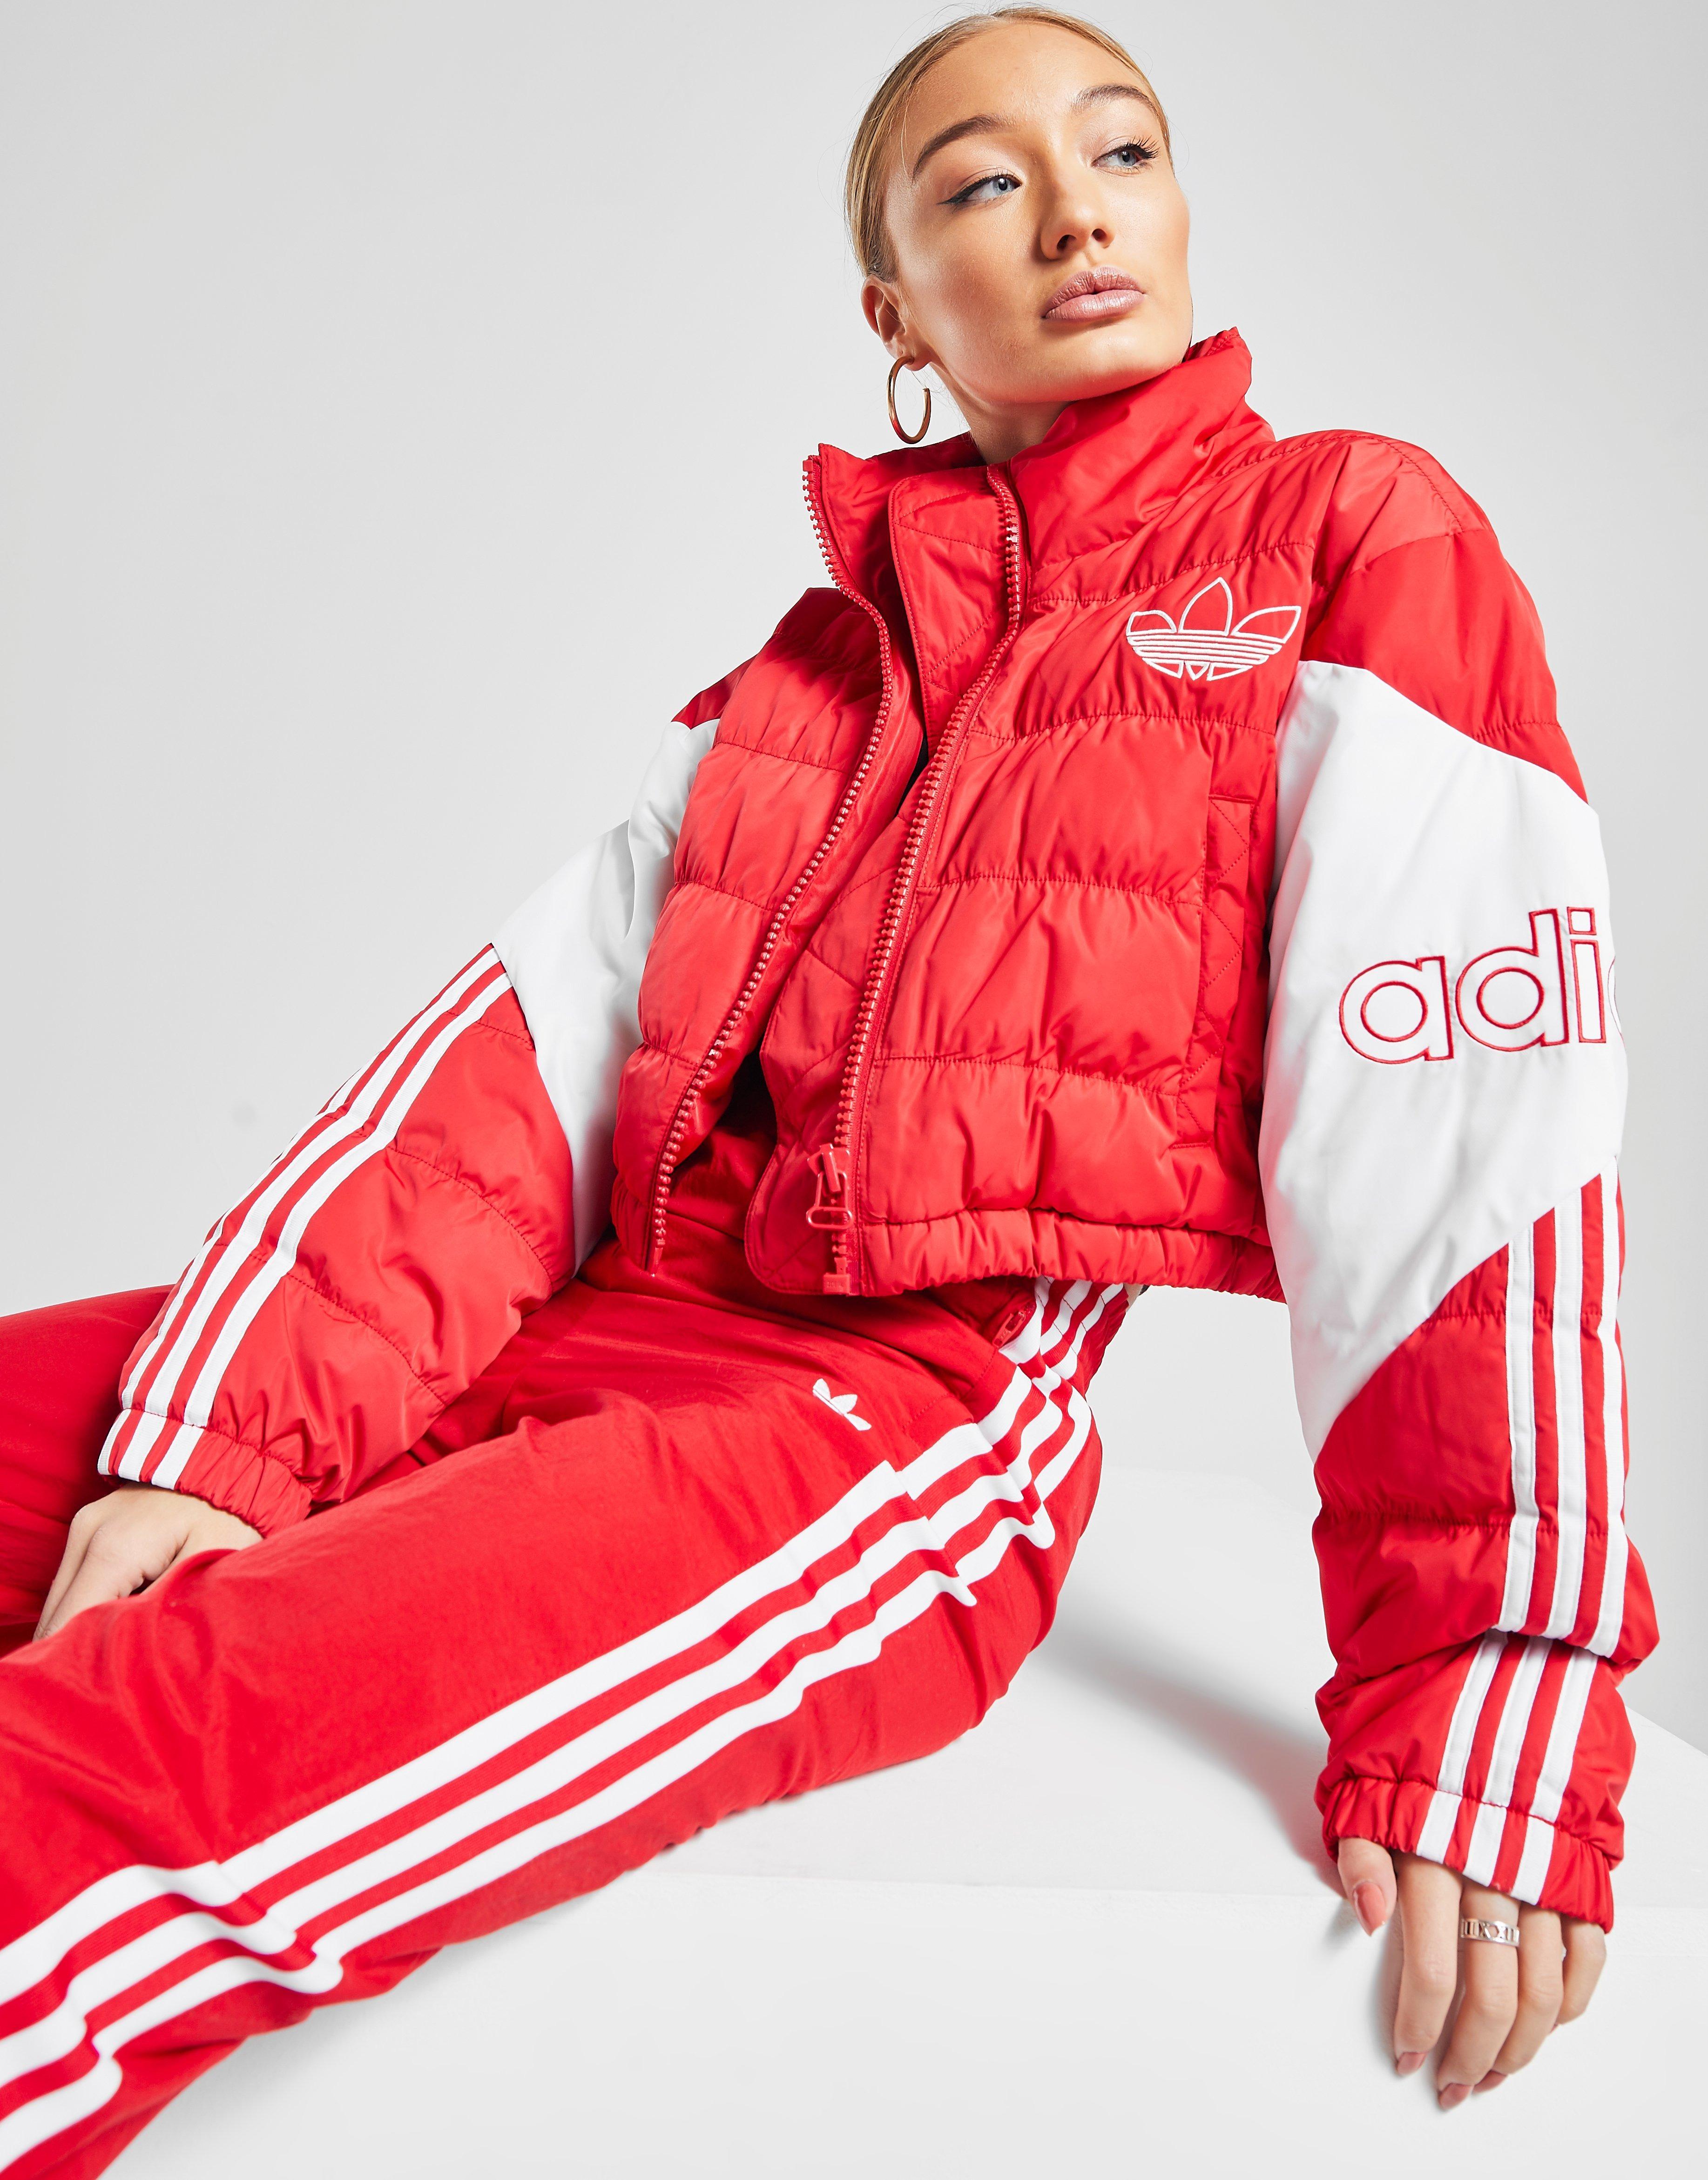 Women's adidas Originals Vocal Taped Padded Jacket Pink Spirit